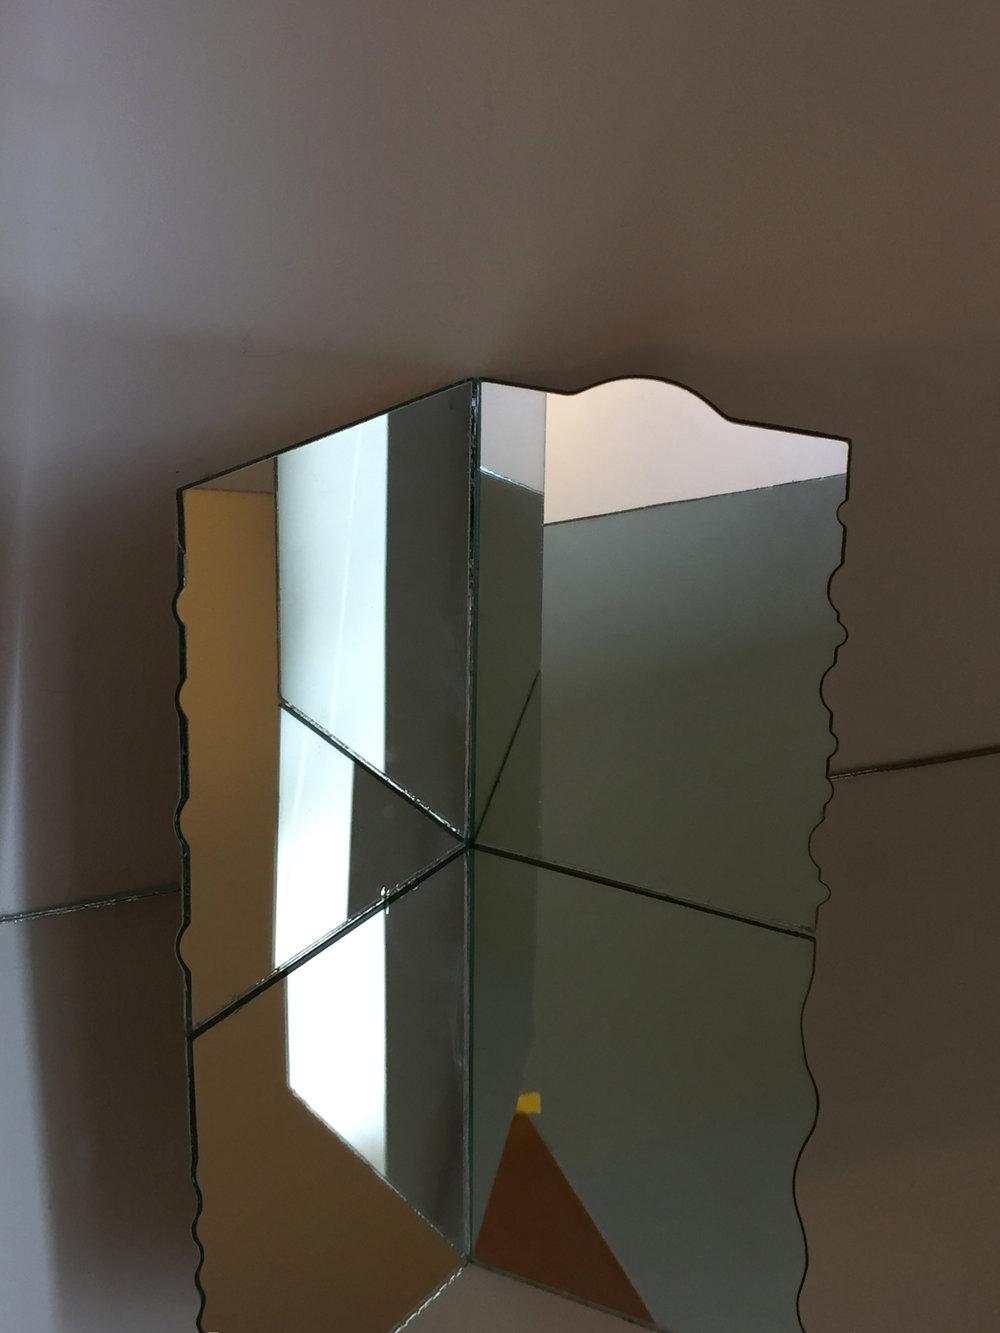 MirrorStudy24.1.jpg